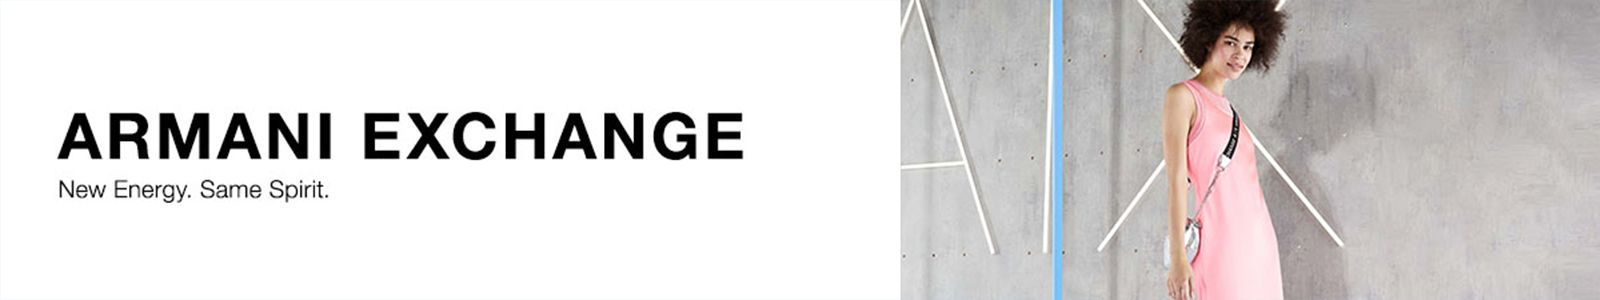 Armani Exchange, New Energy Spirit.